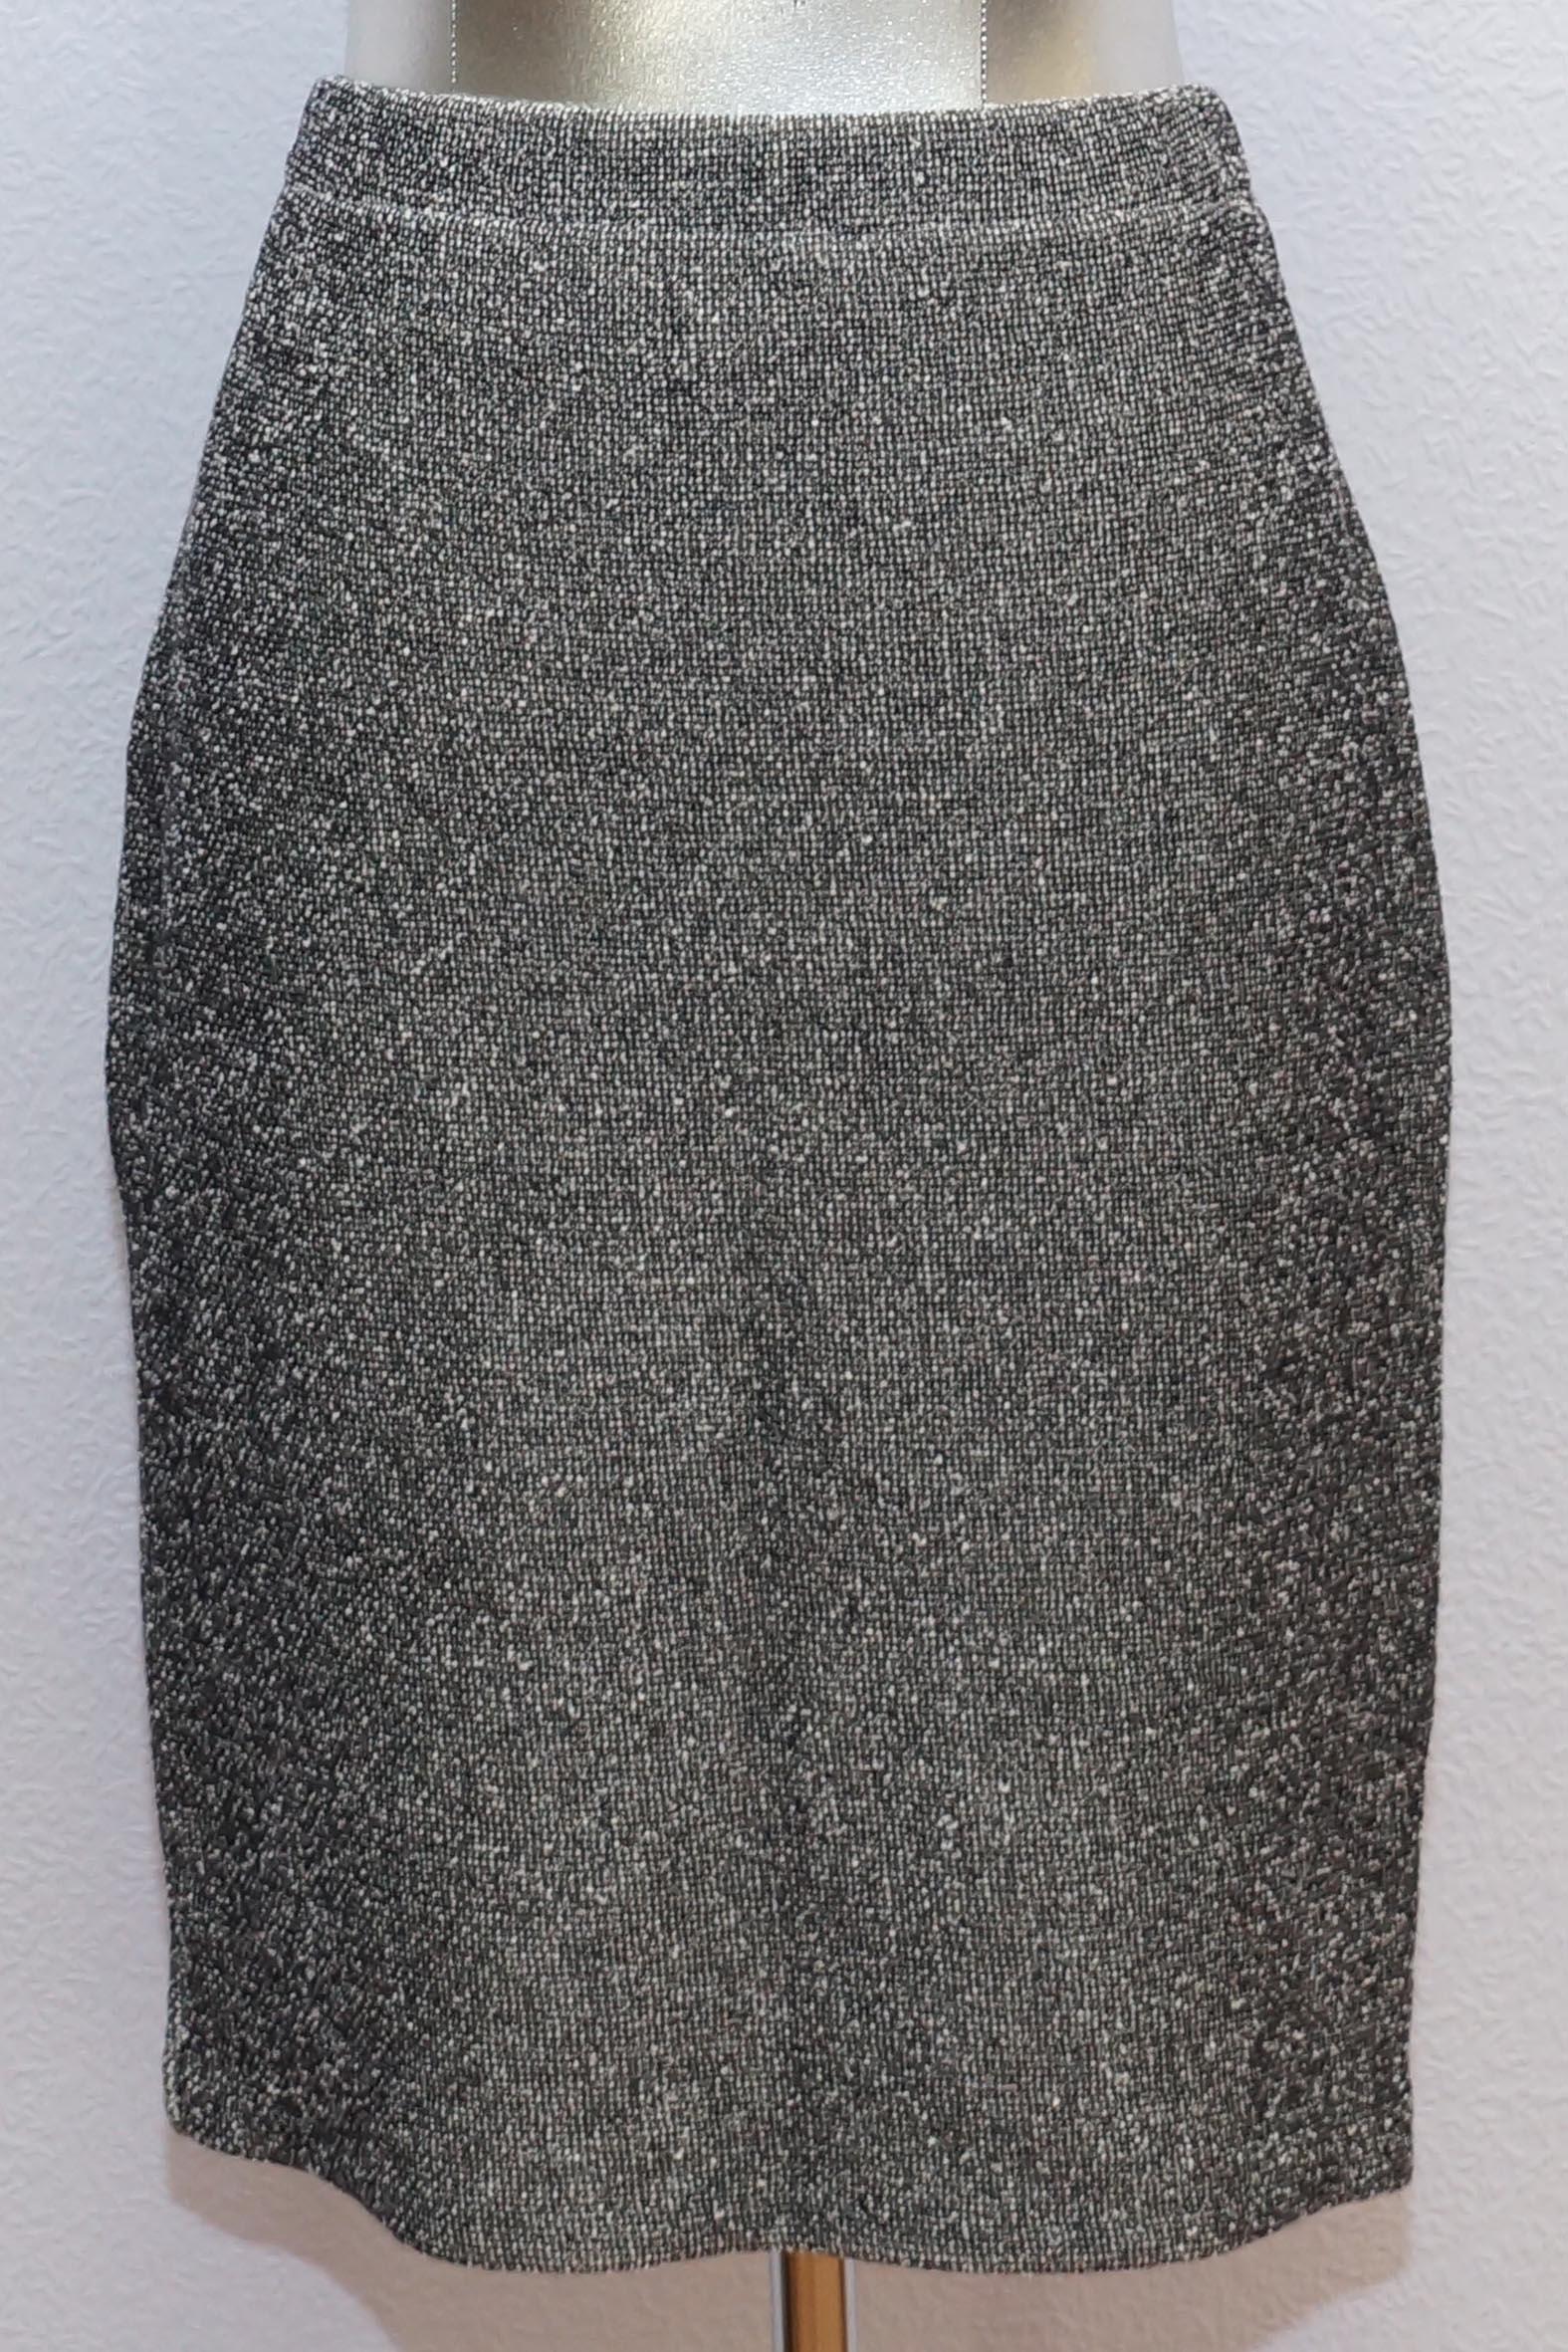 550038/15-01 Юбка тр. Stizzoli